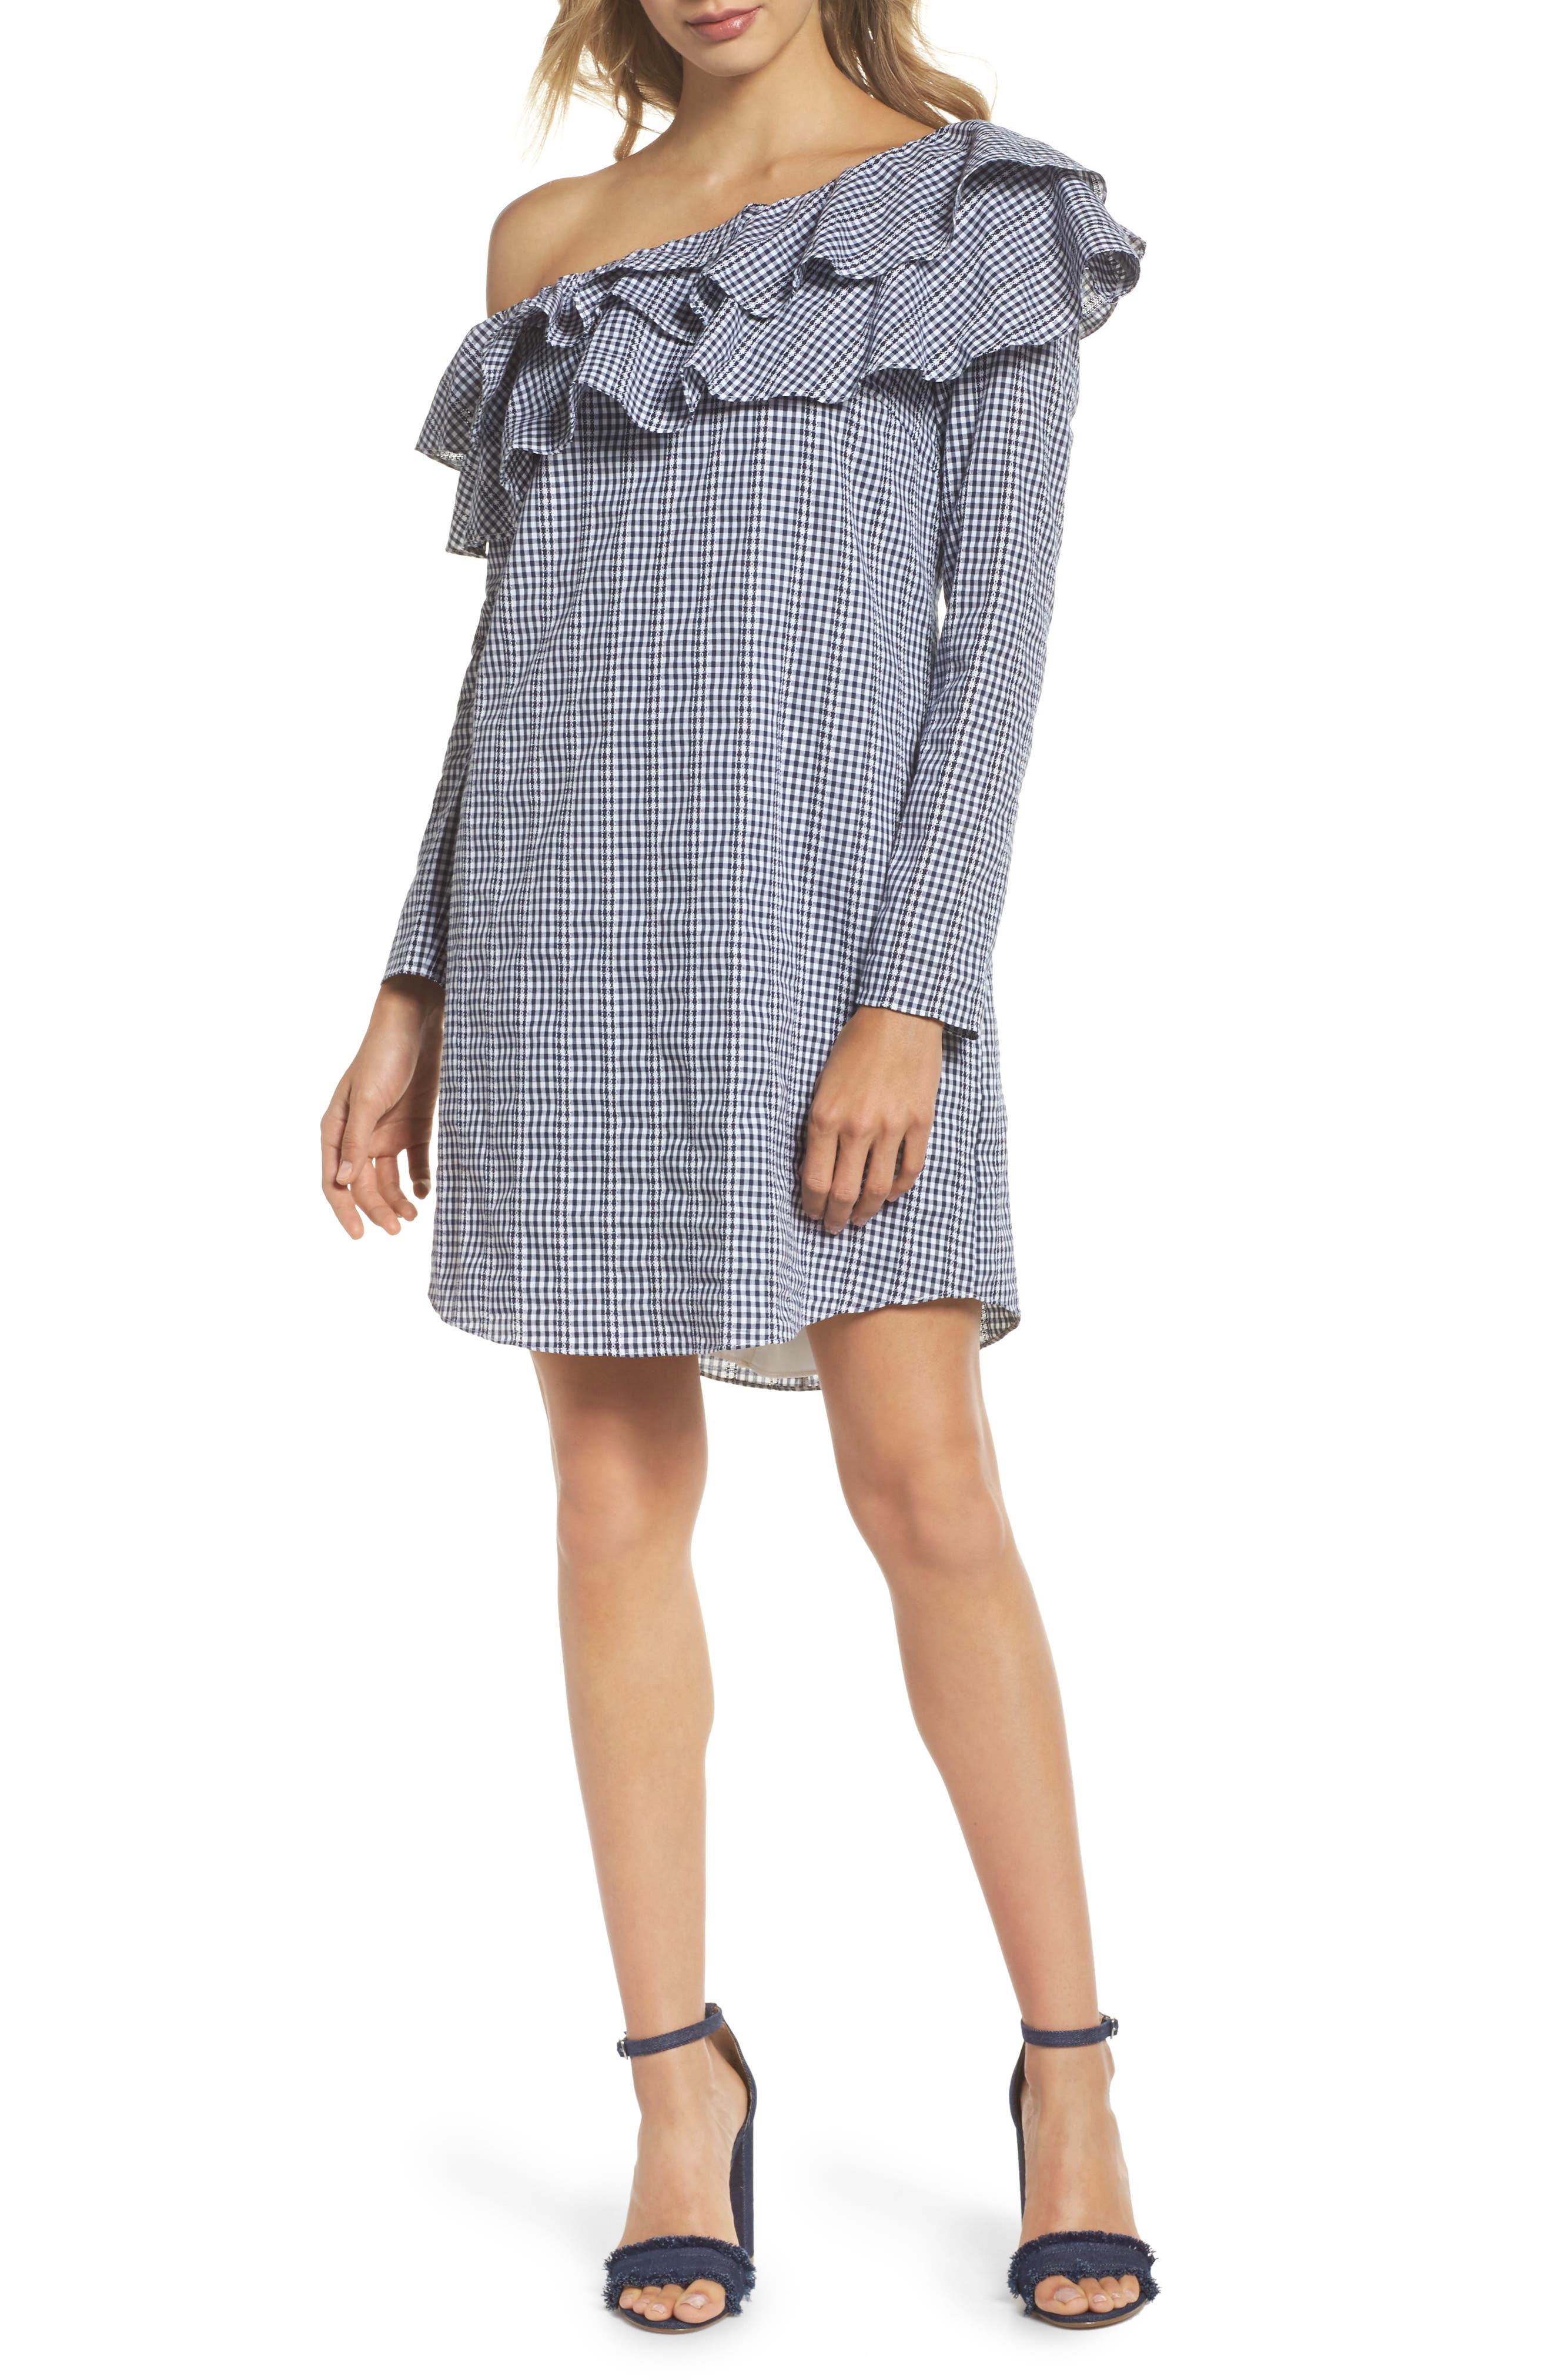 ADELYN RAE,                             Gingham One-Shoulder Ruffle Dress,                             Main thumbnail 1, color,                             410